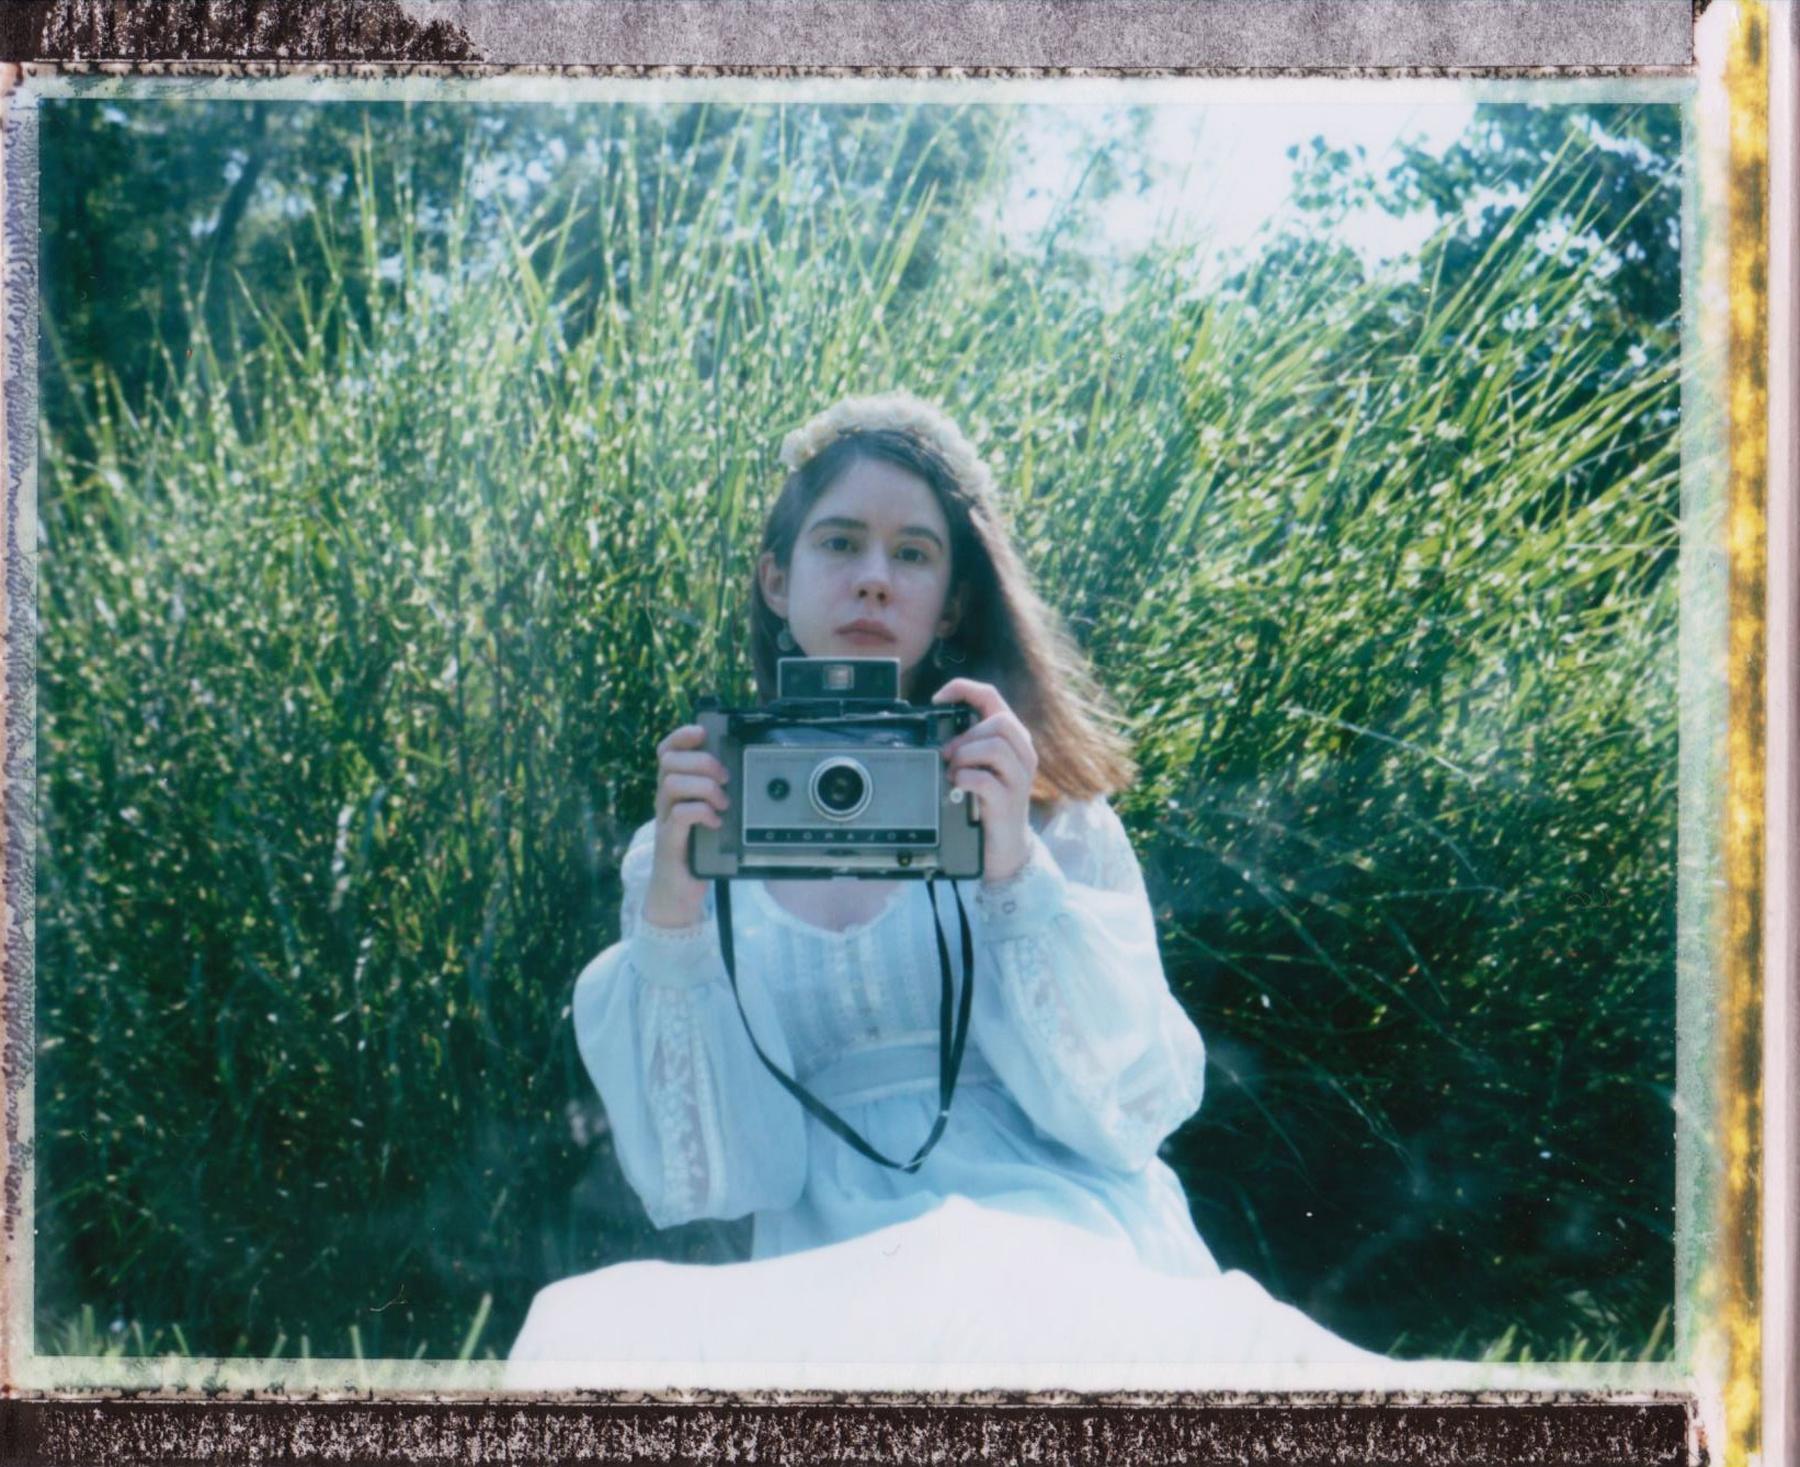 Back to the 70s | Polaroid 230 Land Camera | Abigail Crone